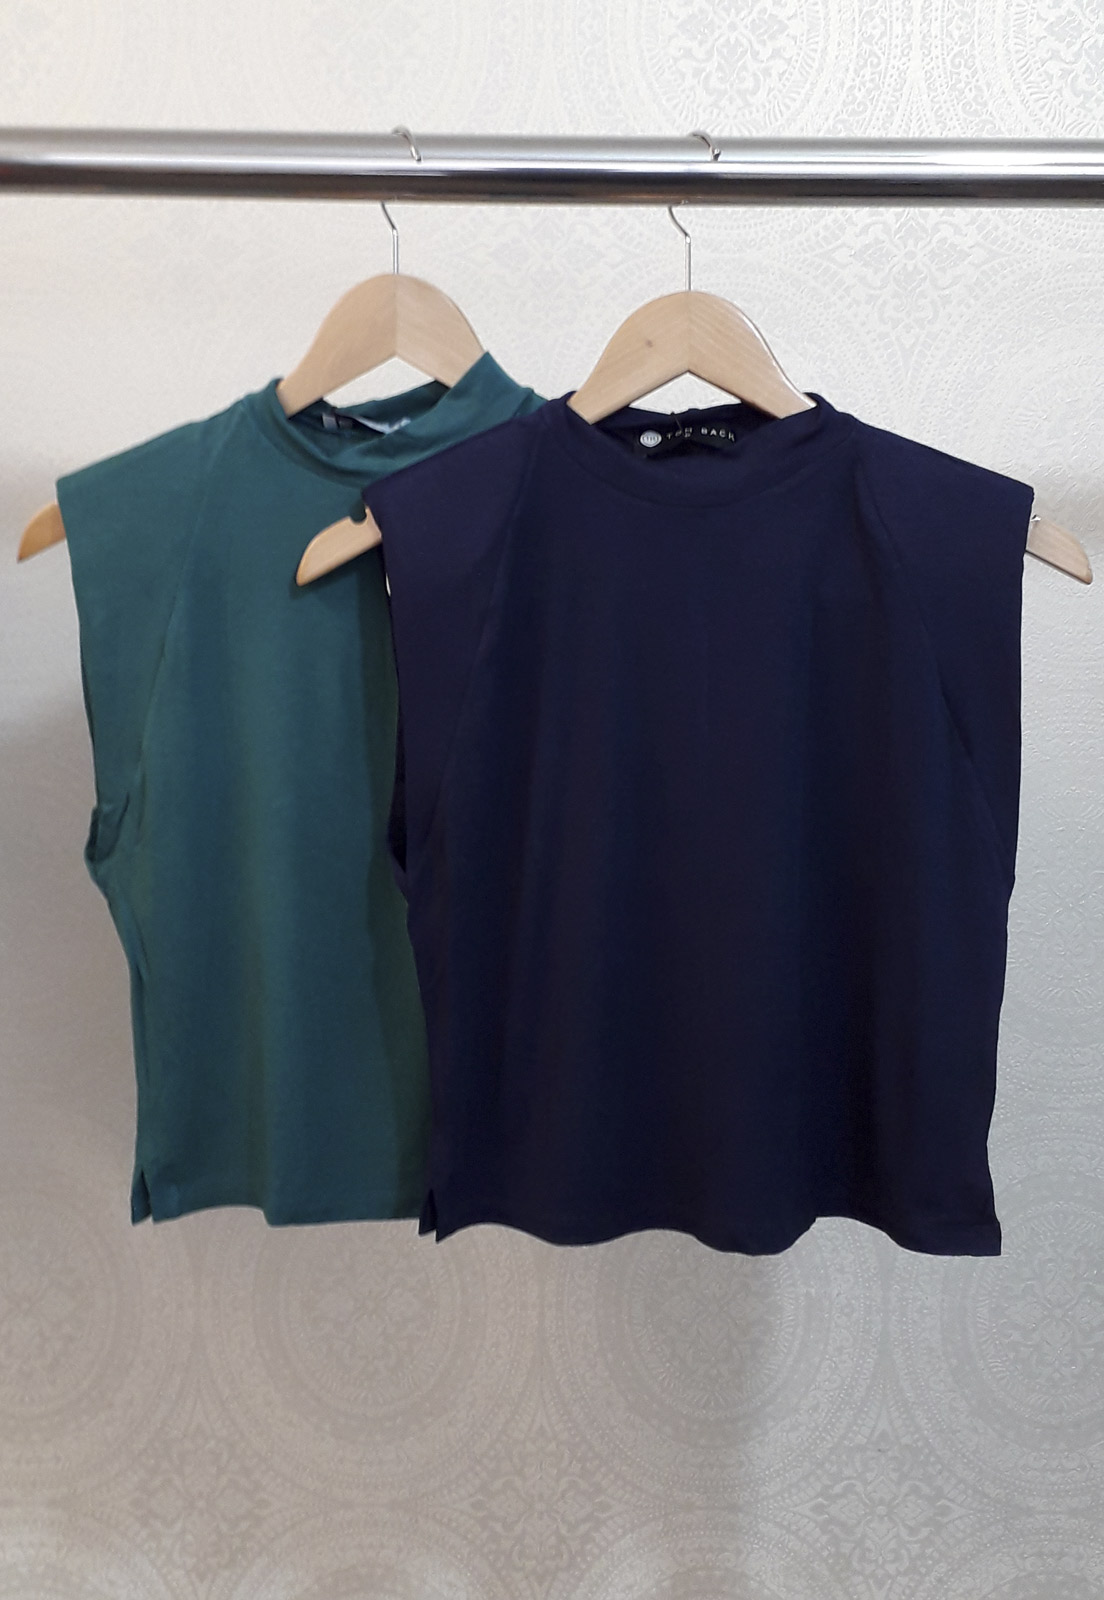 Kit c/ 2 T-shirts Maia - Azul e Verde